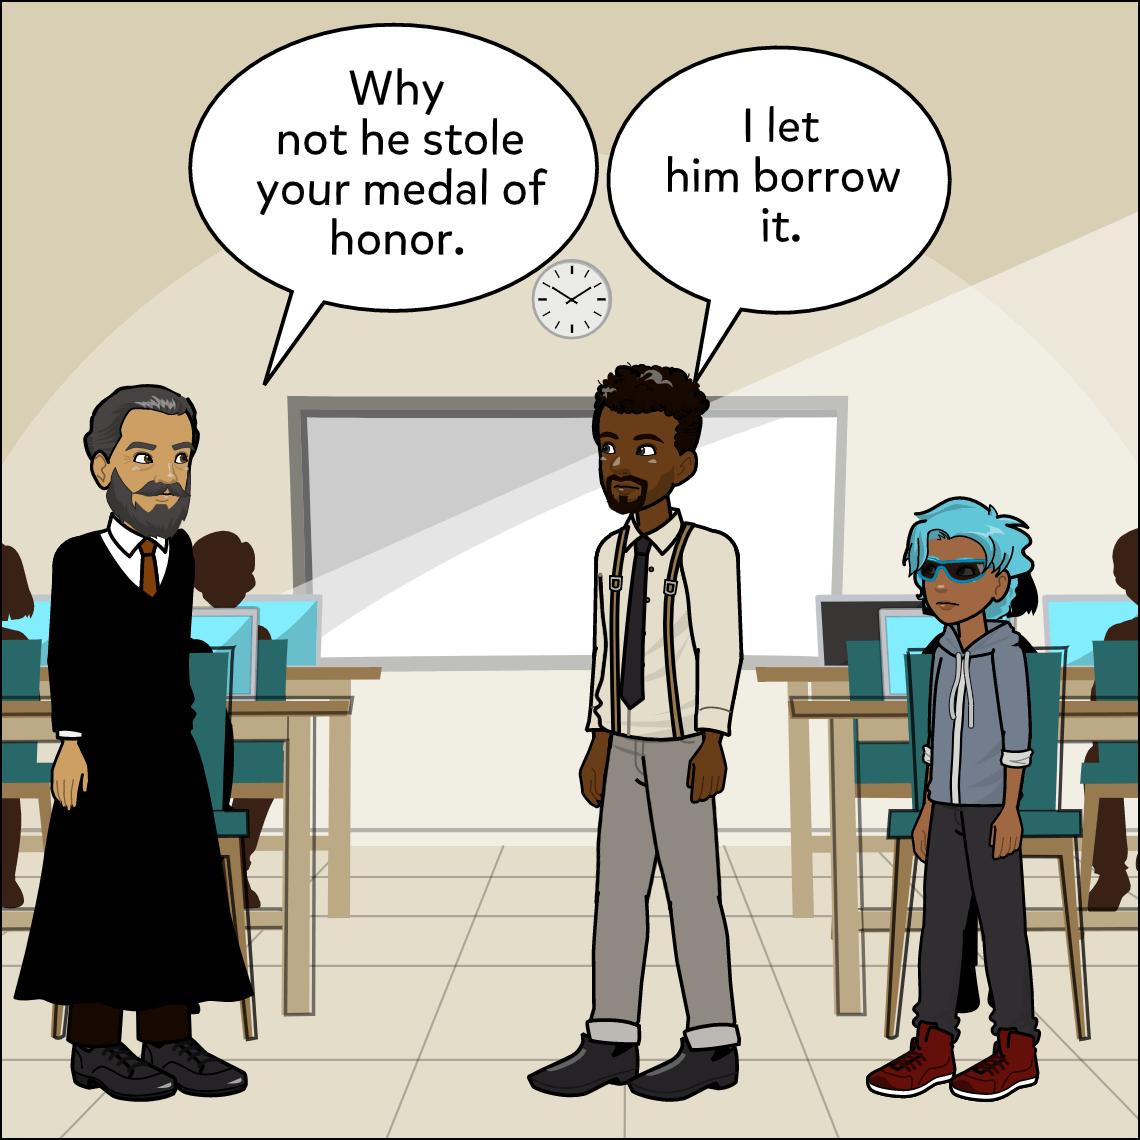 recreating stories lesson exemplar comic panel 3